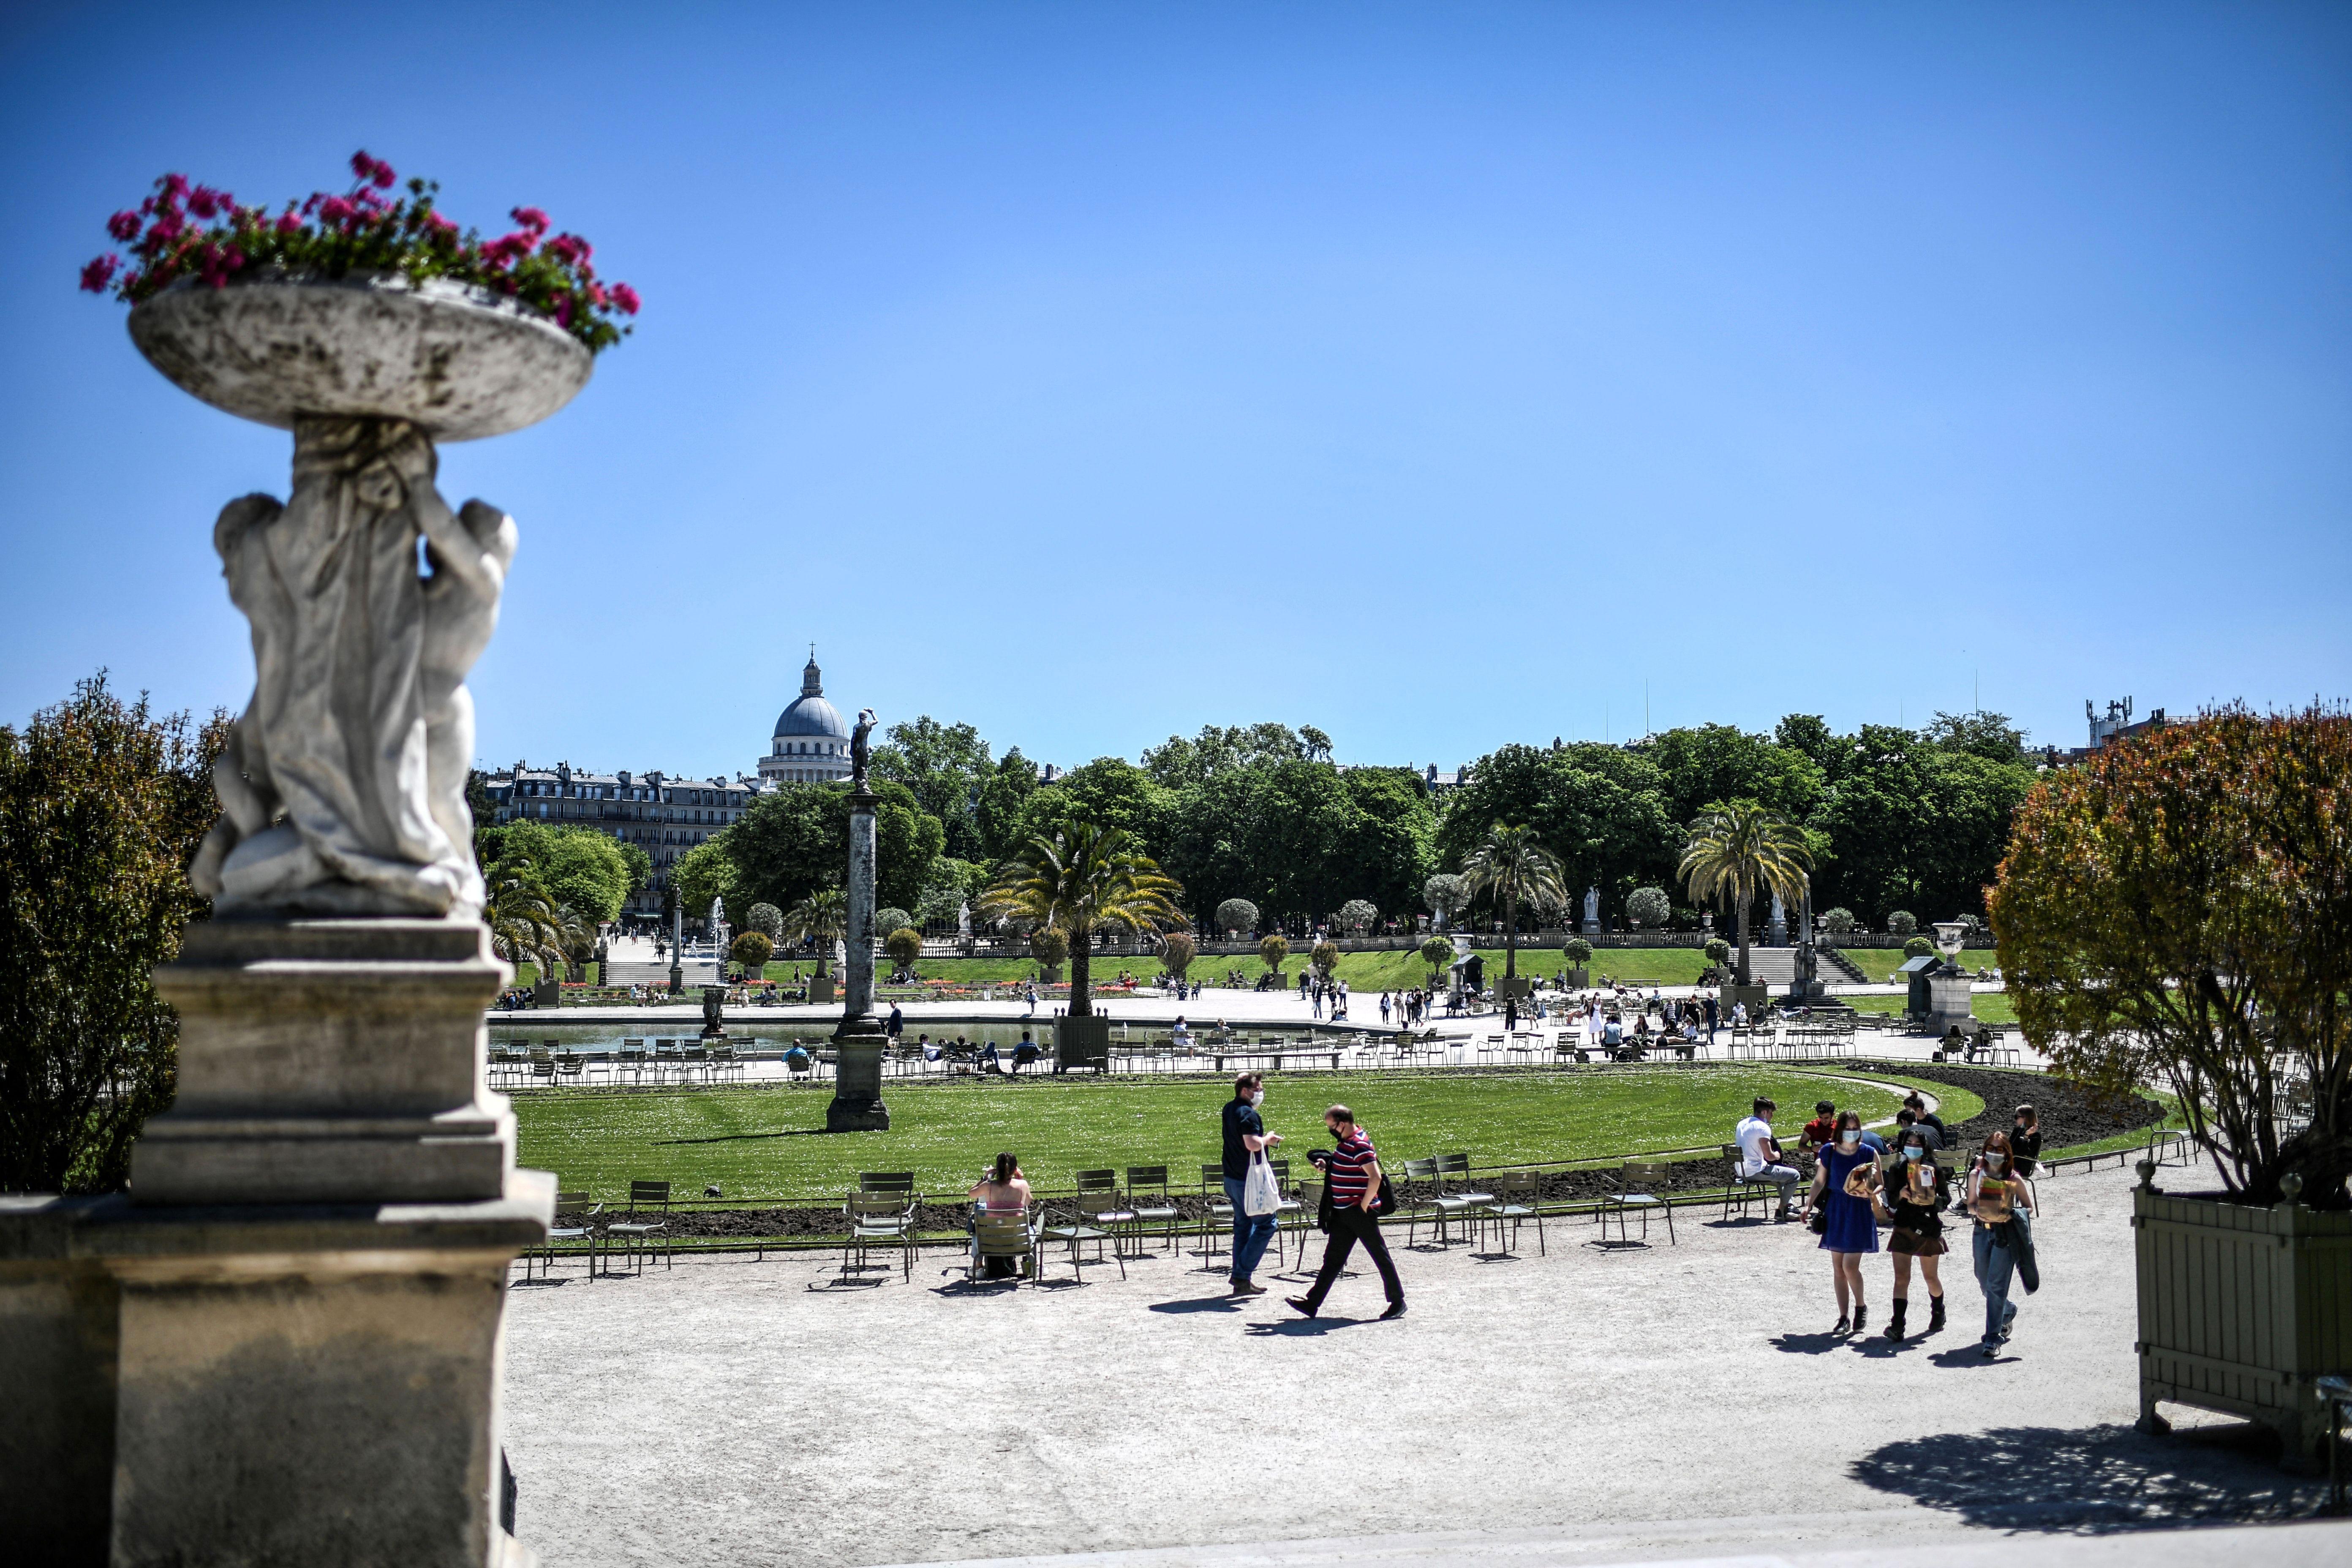 People visit the Luxembourg Garden in Paris on June 1.